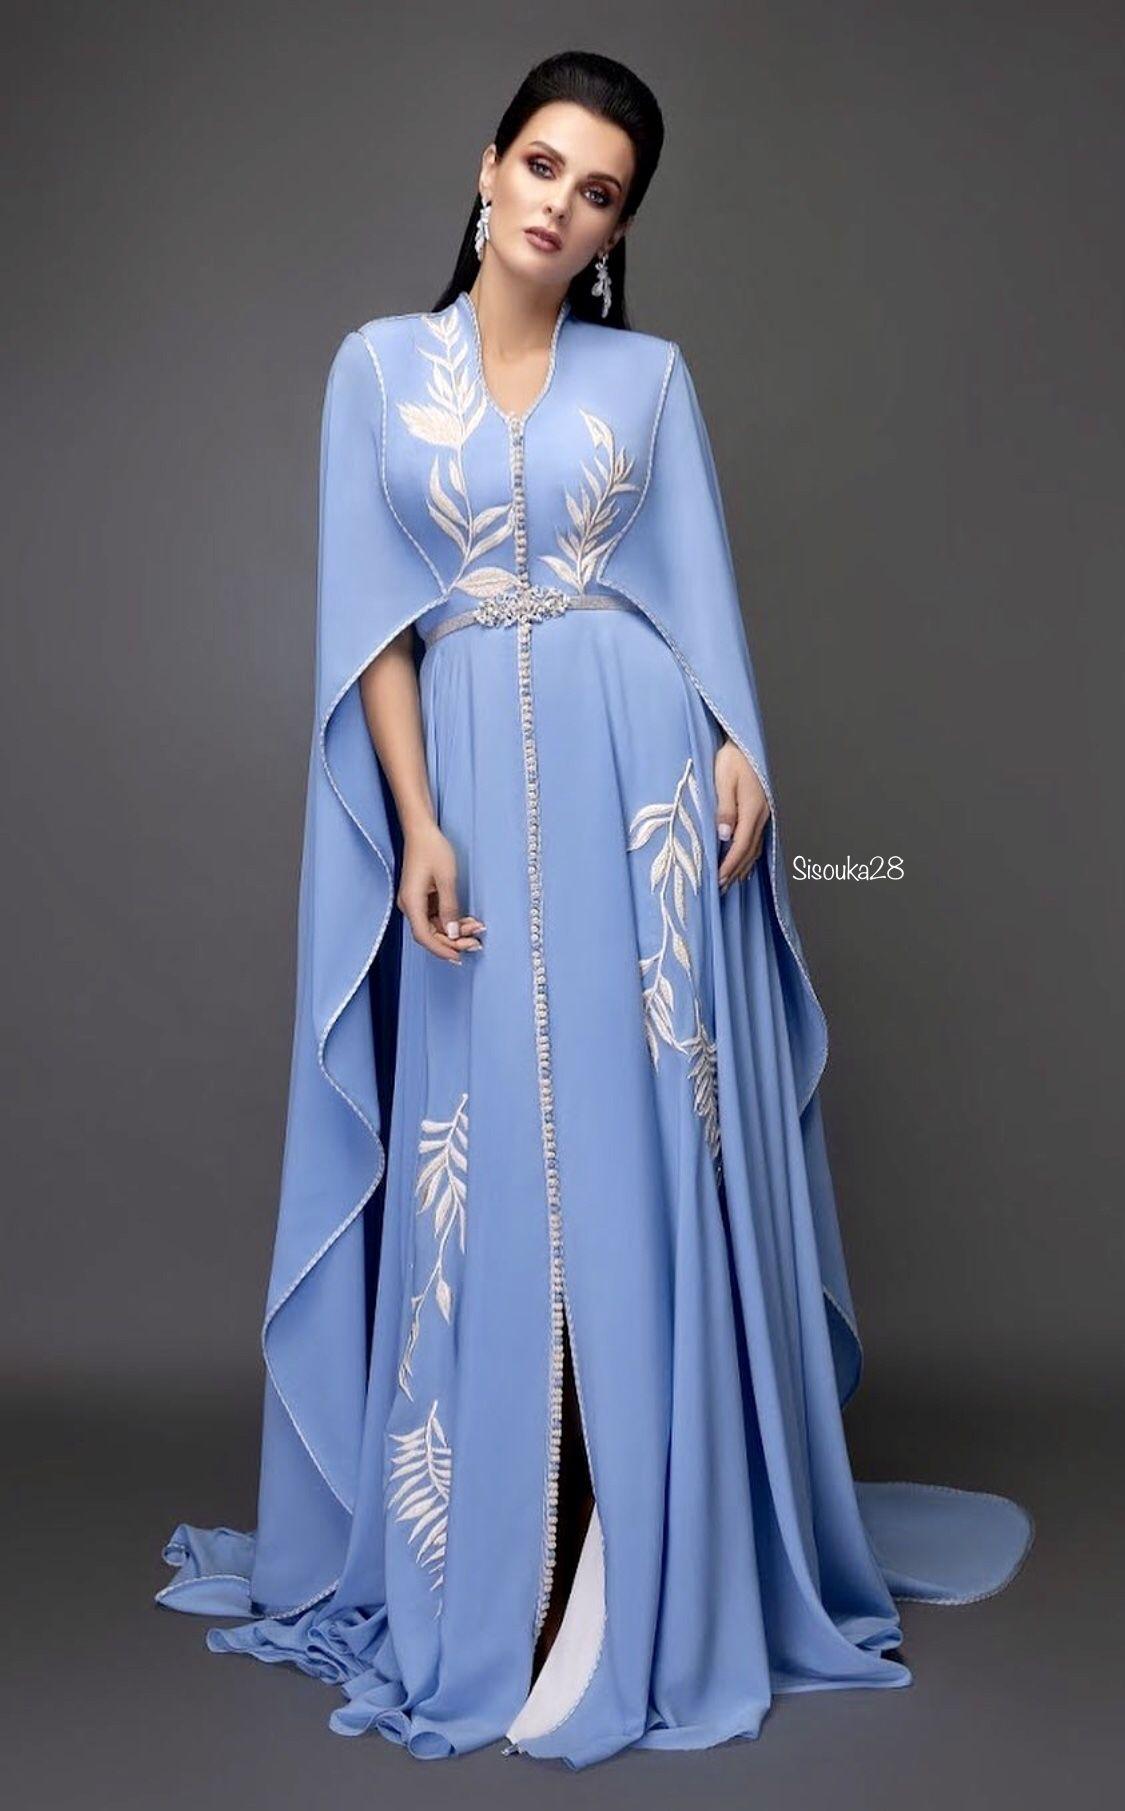 Sophia ben yehya in 18  Moroccan dress, Fashion, Fashion dresses